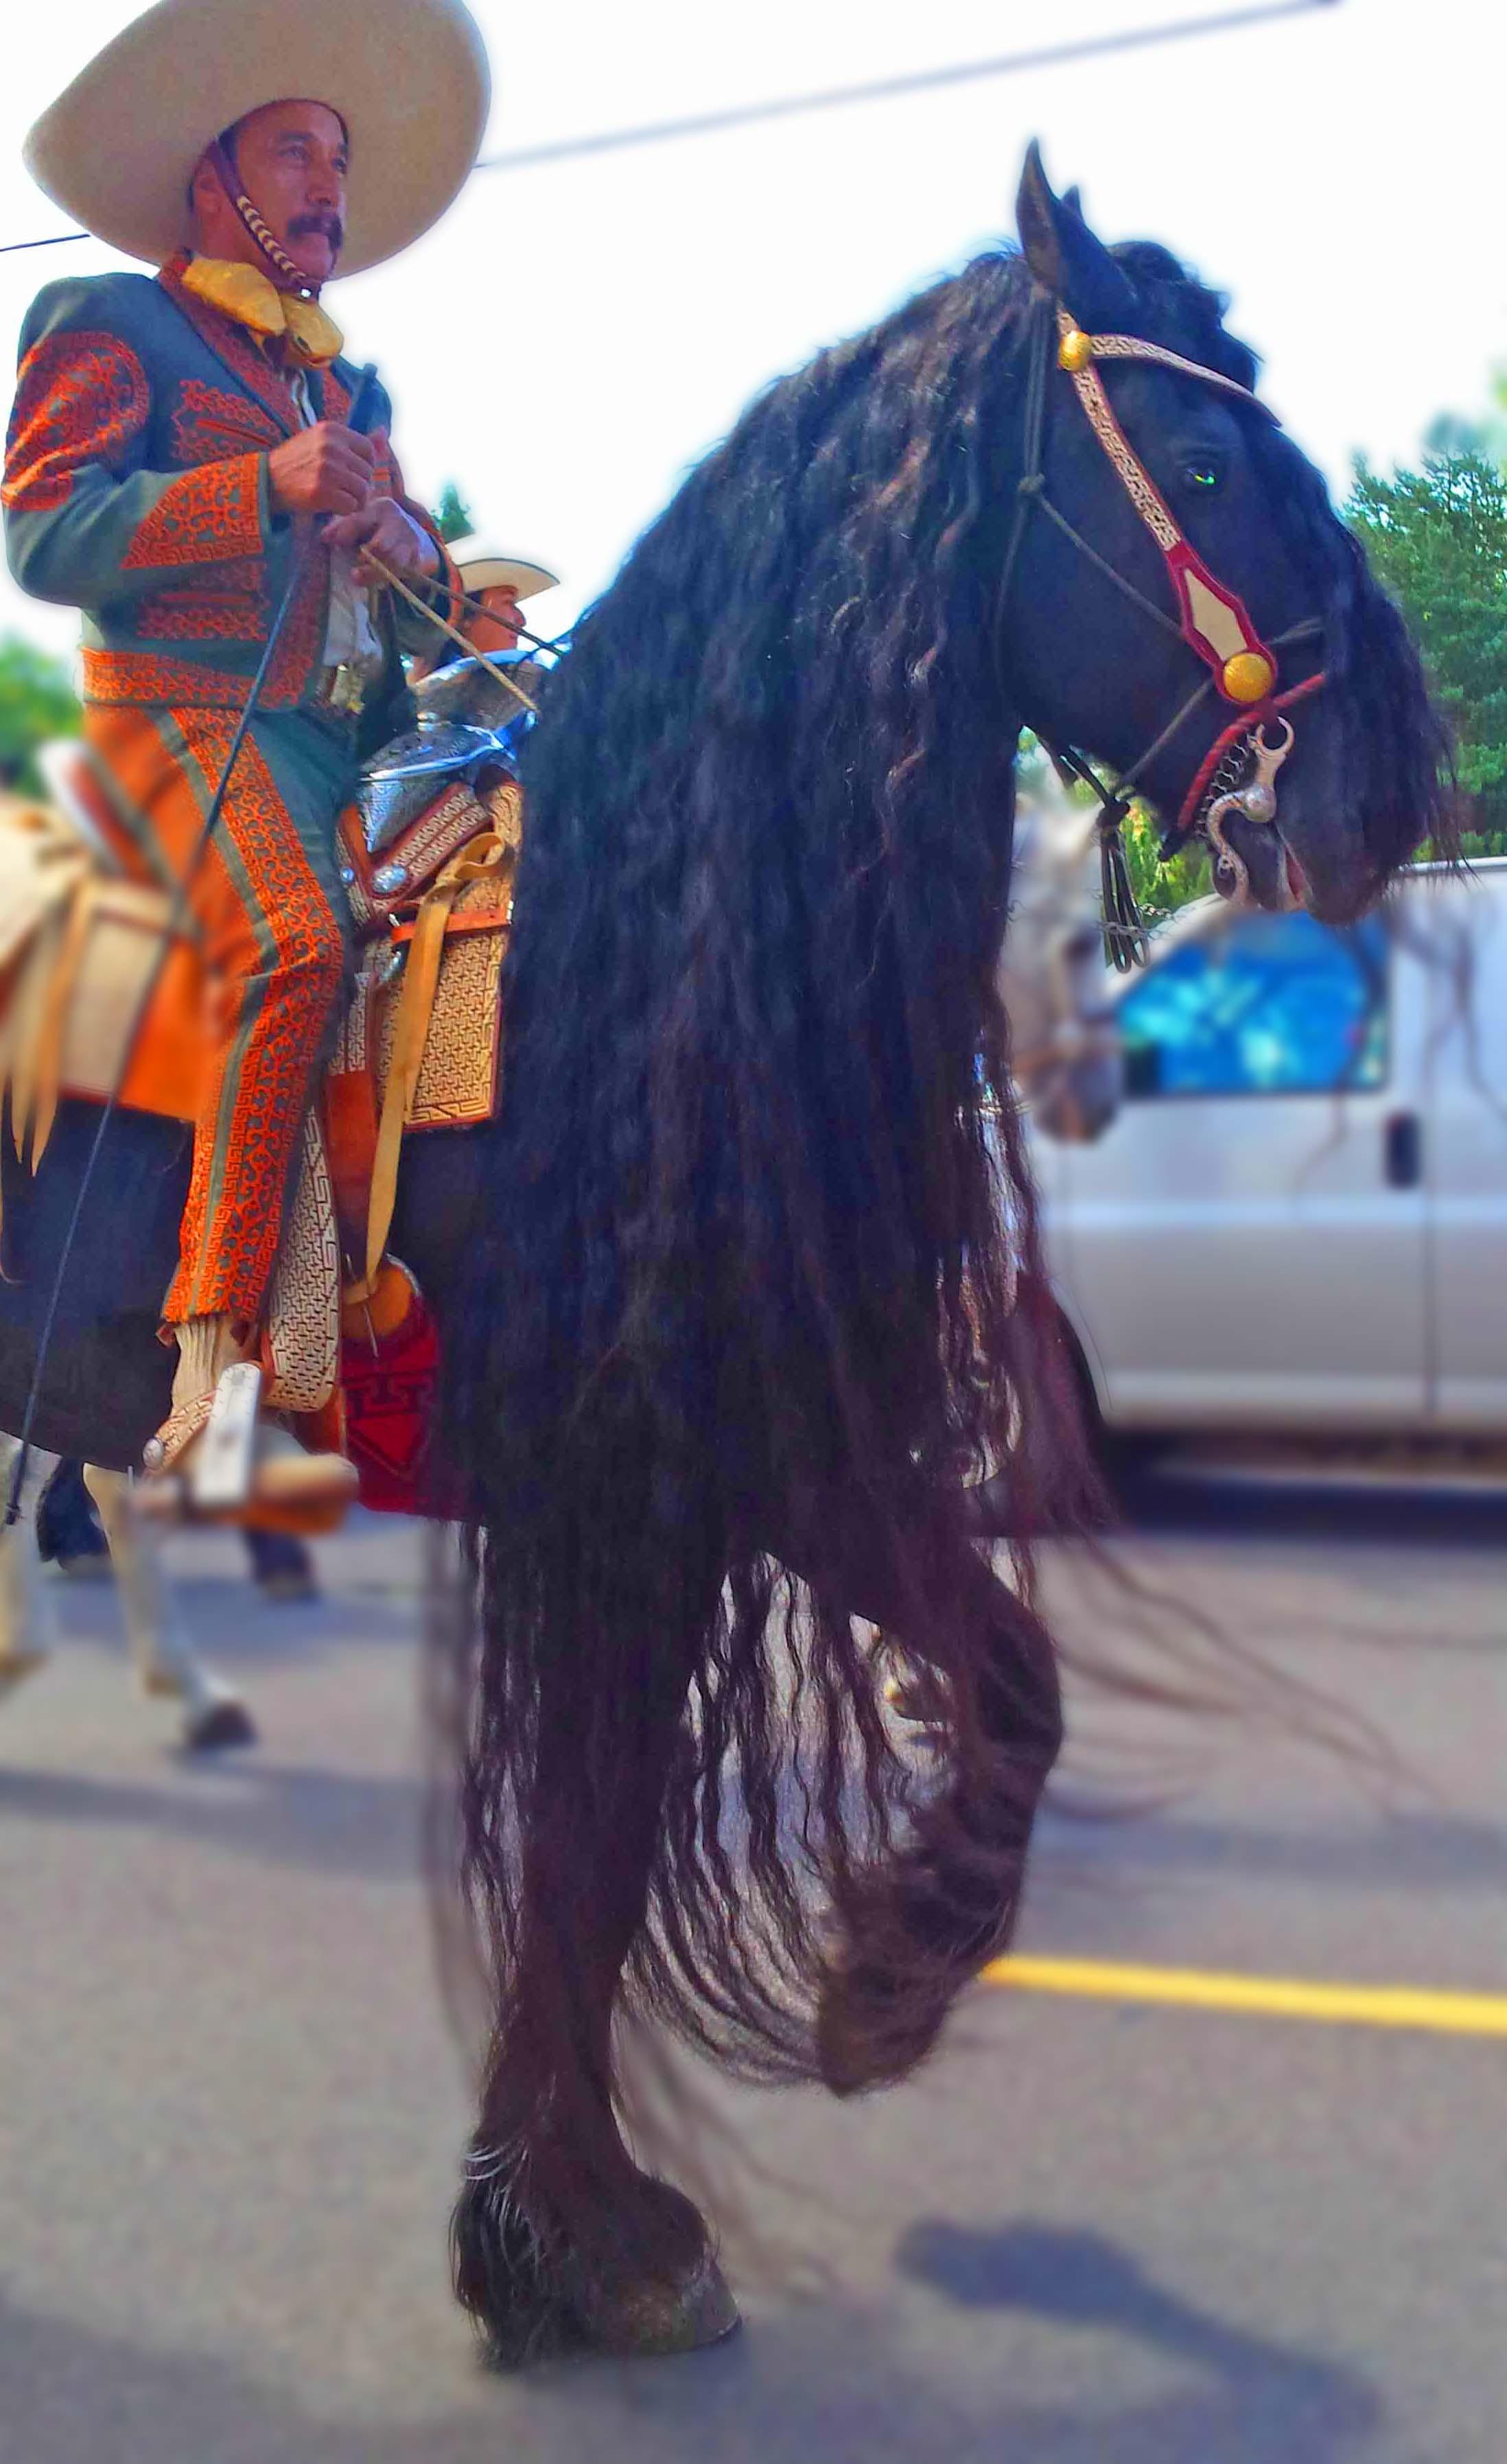 Hola caballo and caballero! Son muy guapo!